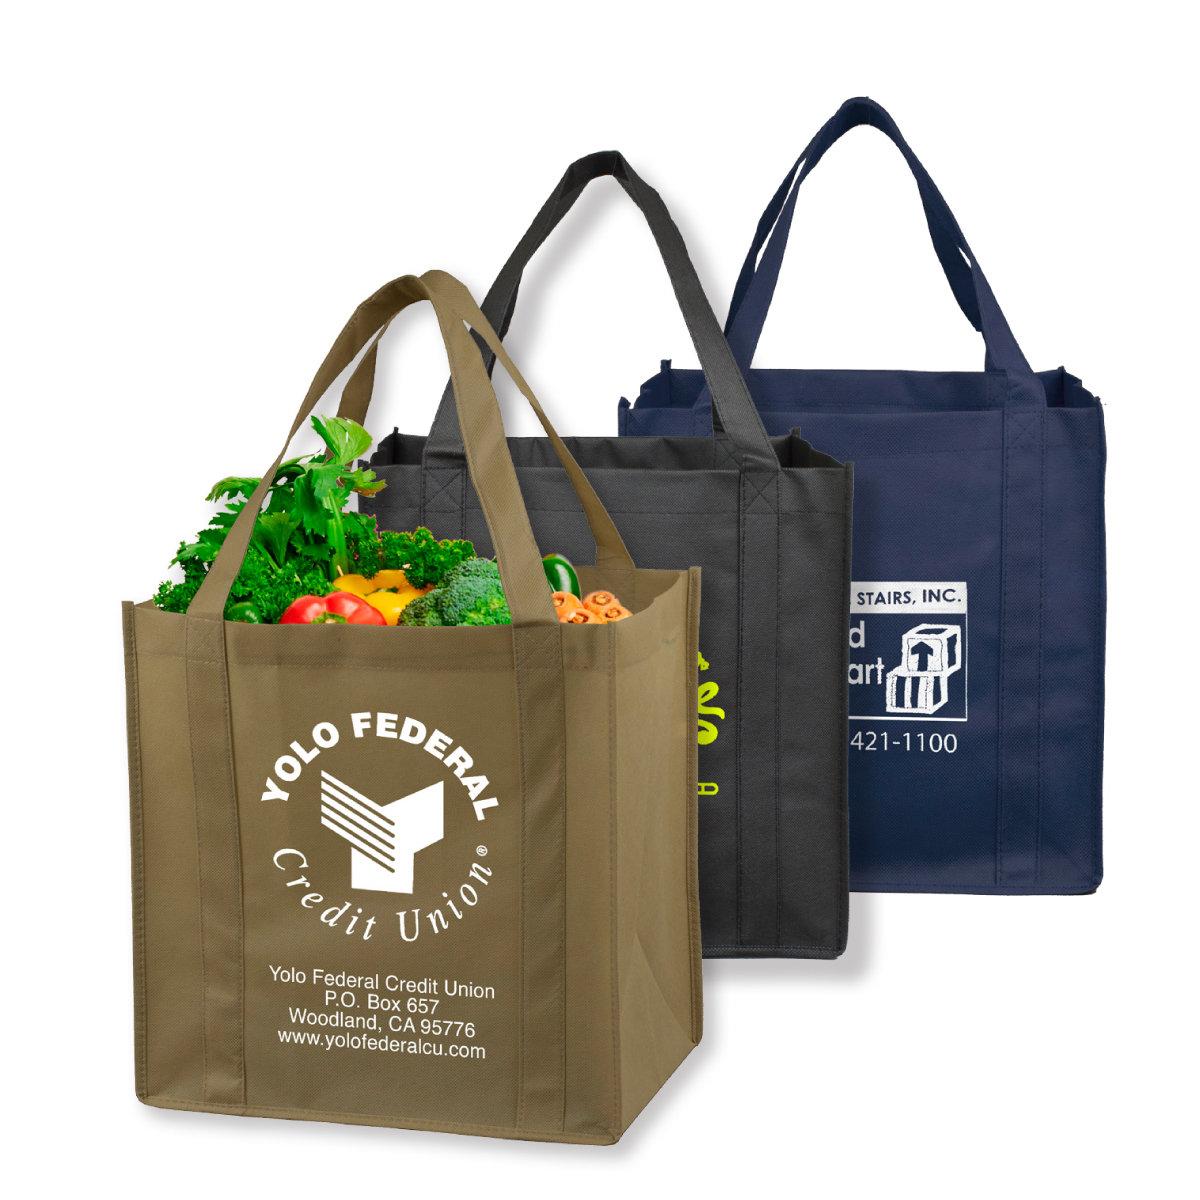 "12-1/2"" W x 13"" H - Mega Grocery Shopping Tote Bag. $1.65 each."